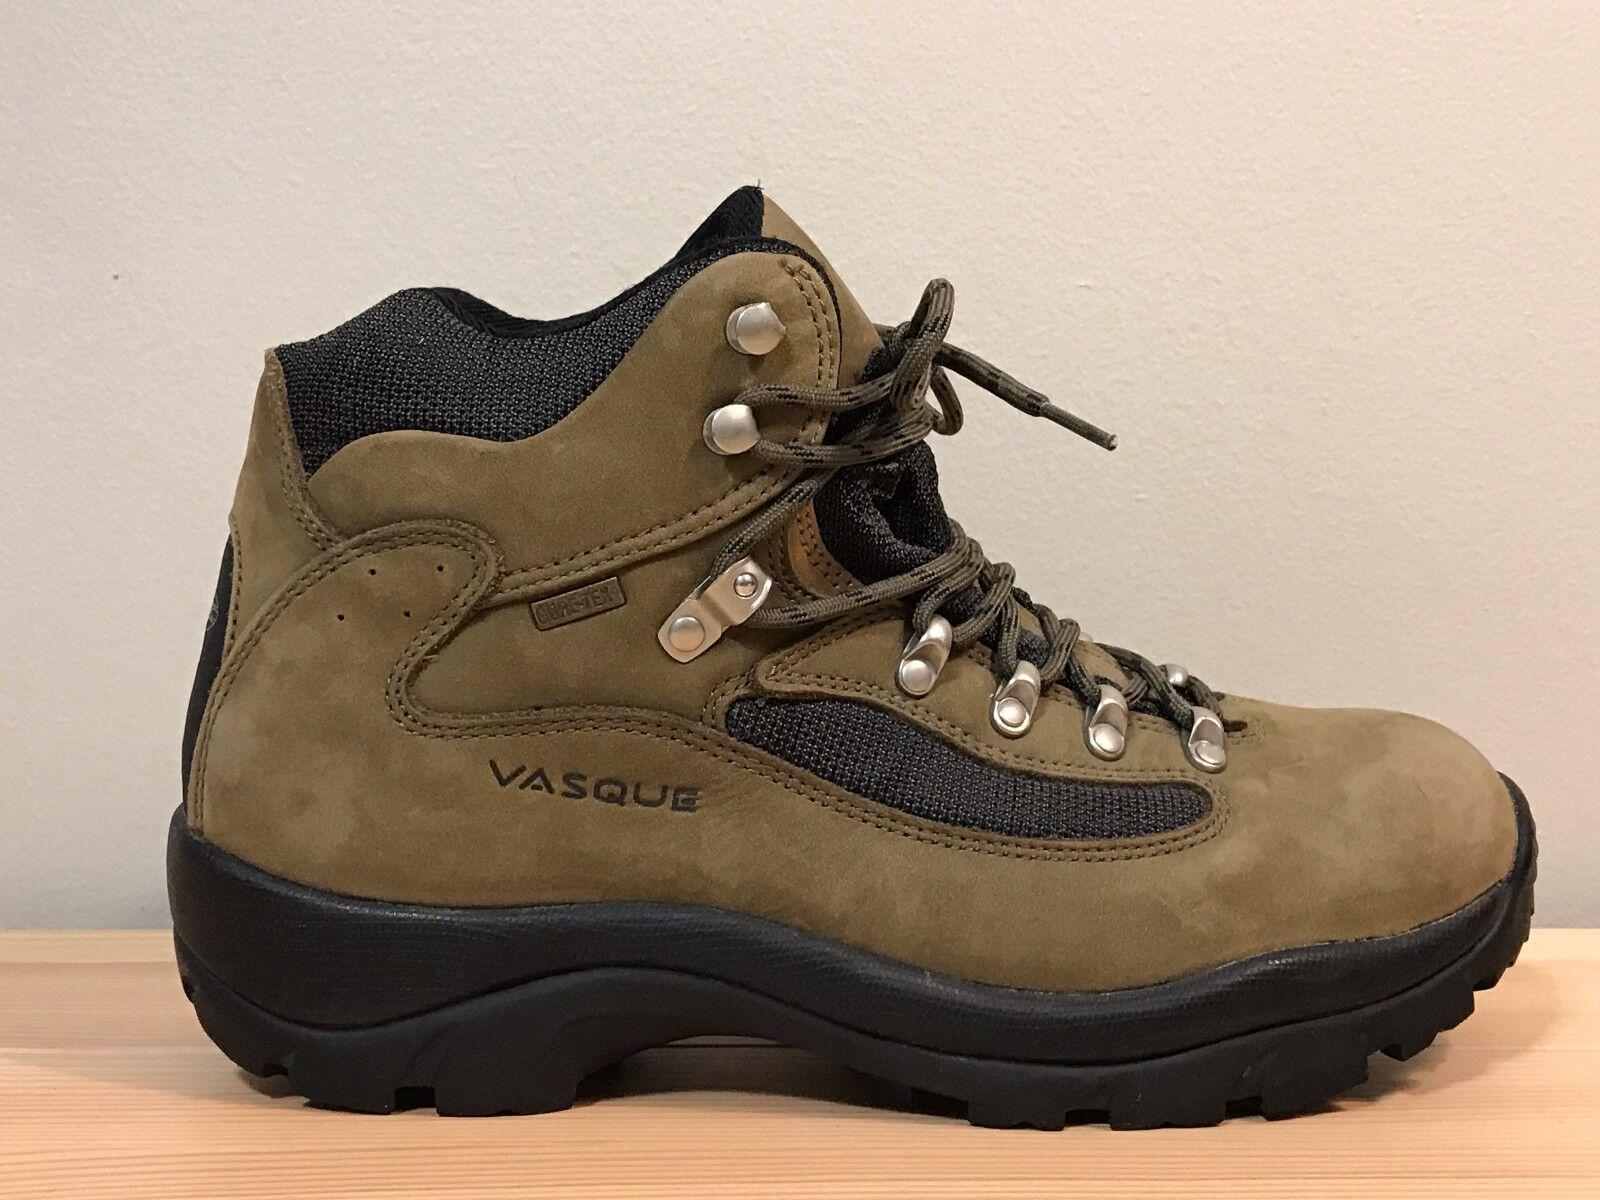 Vasque Skywalk Brown Leather Gore-Tex Hiking Boots Women's Size 10